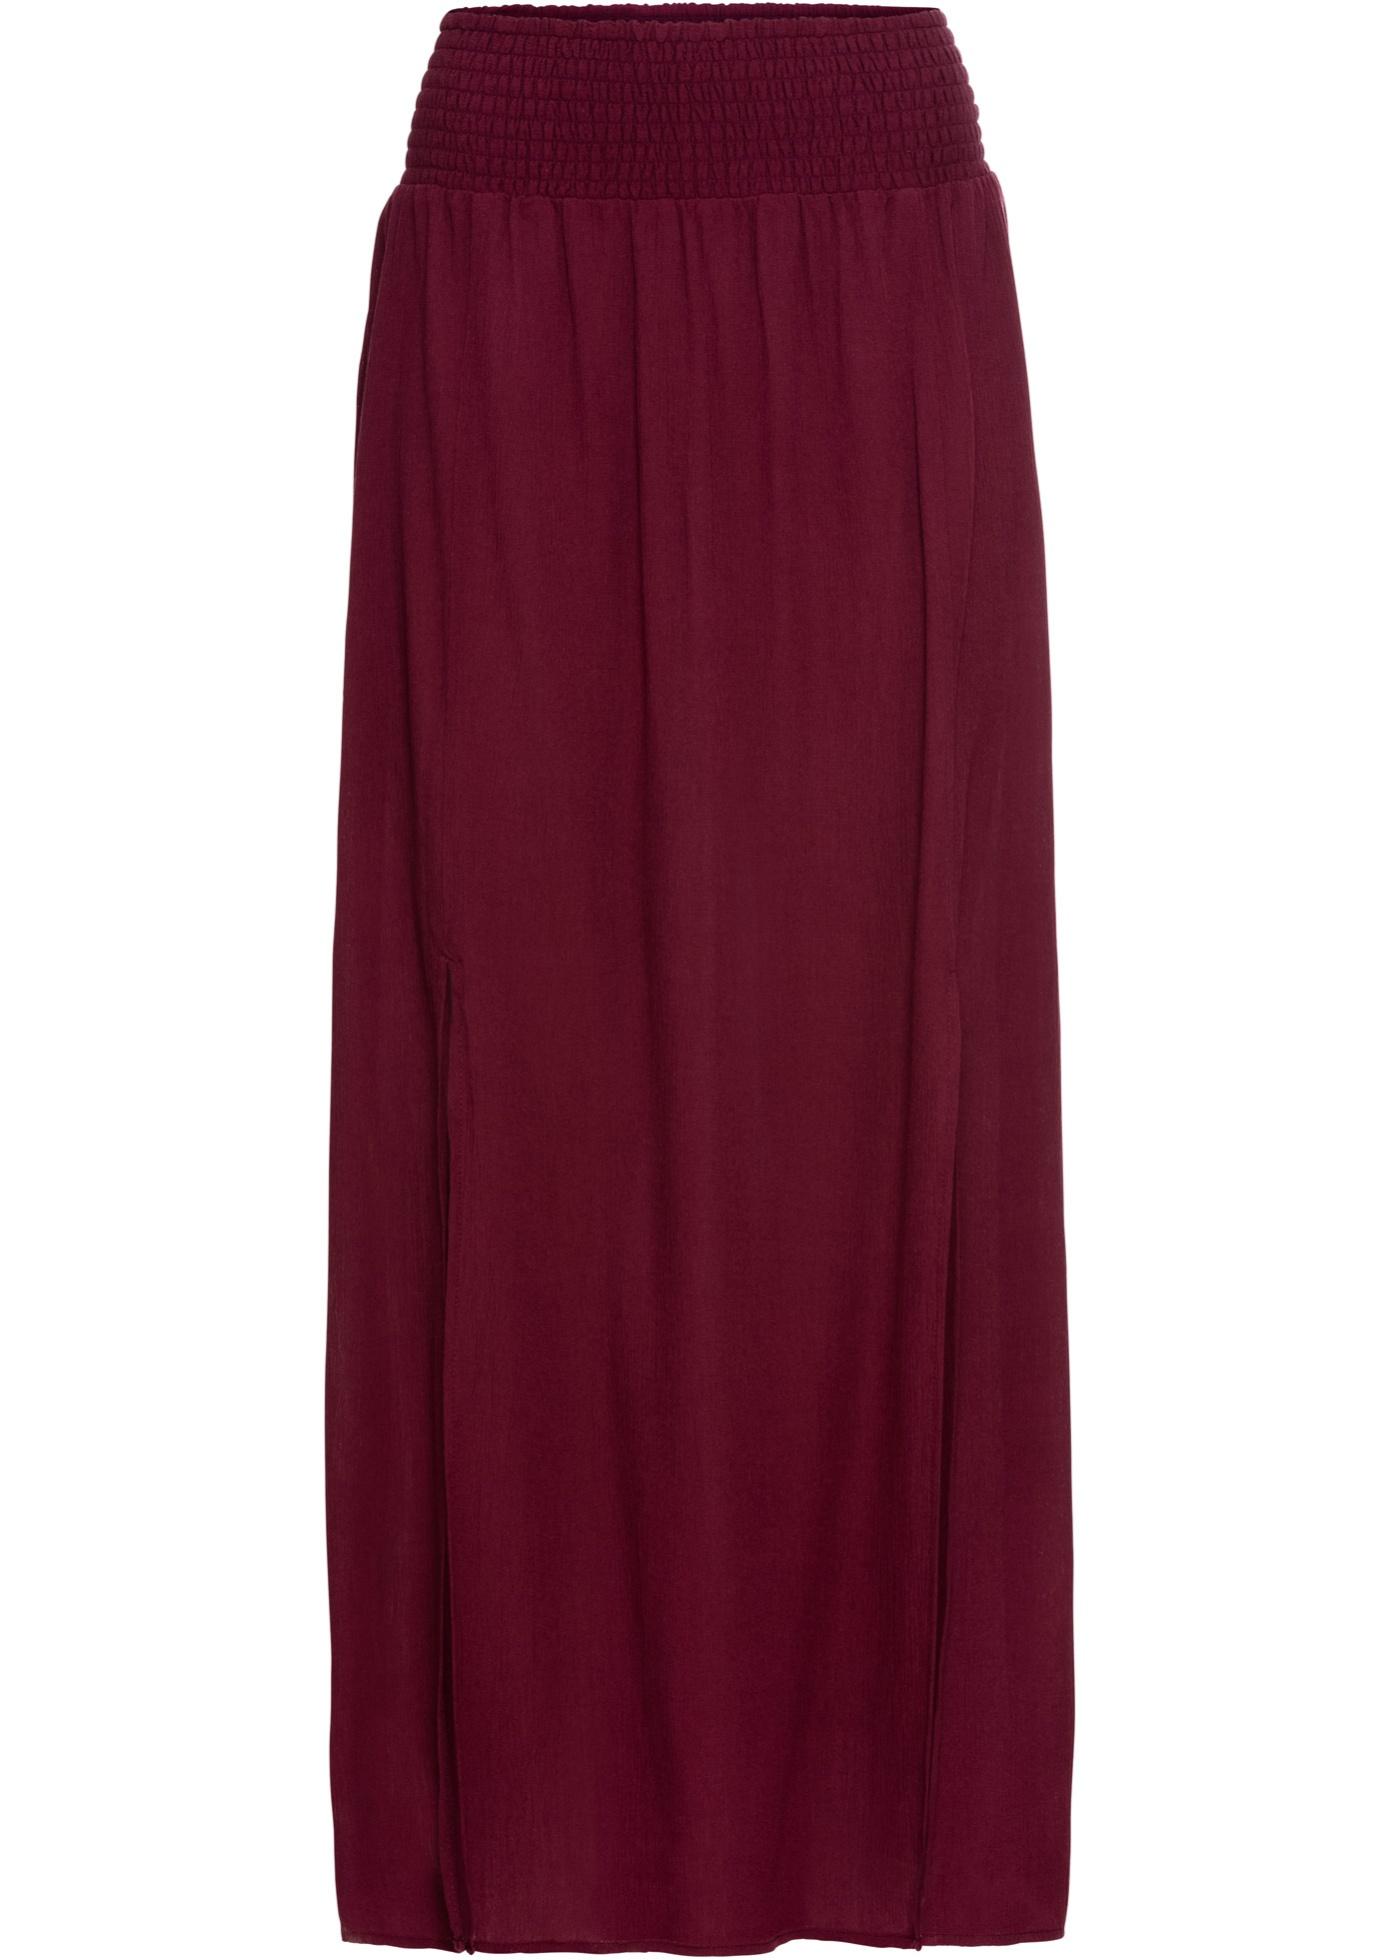 67fb0cecf Dlouha rozevlata sukne cervena levně | Mobilmania zboží